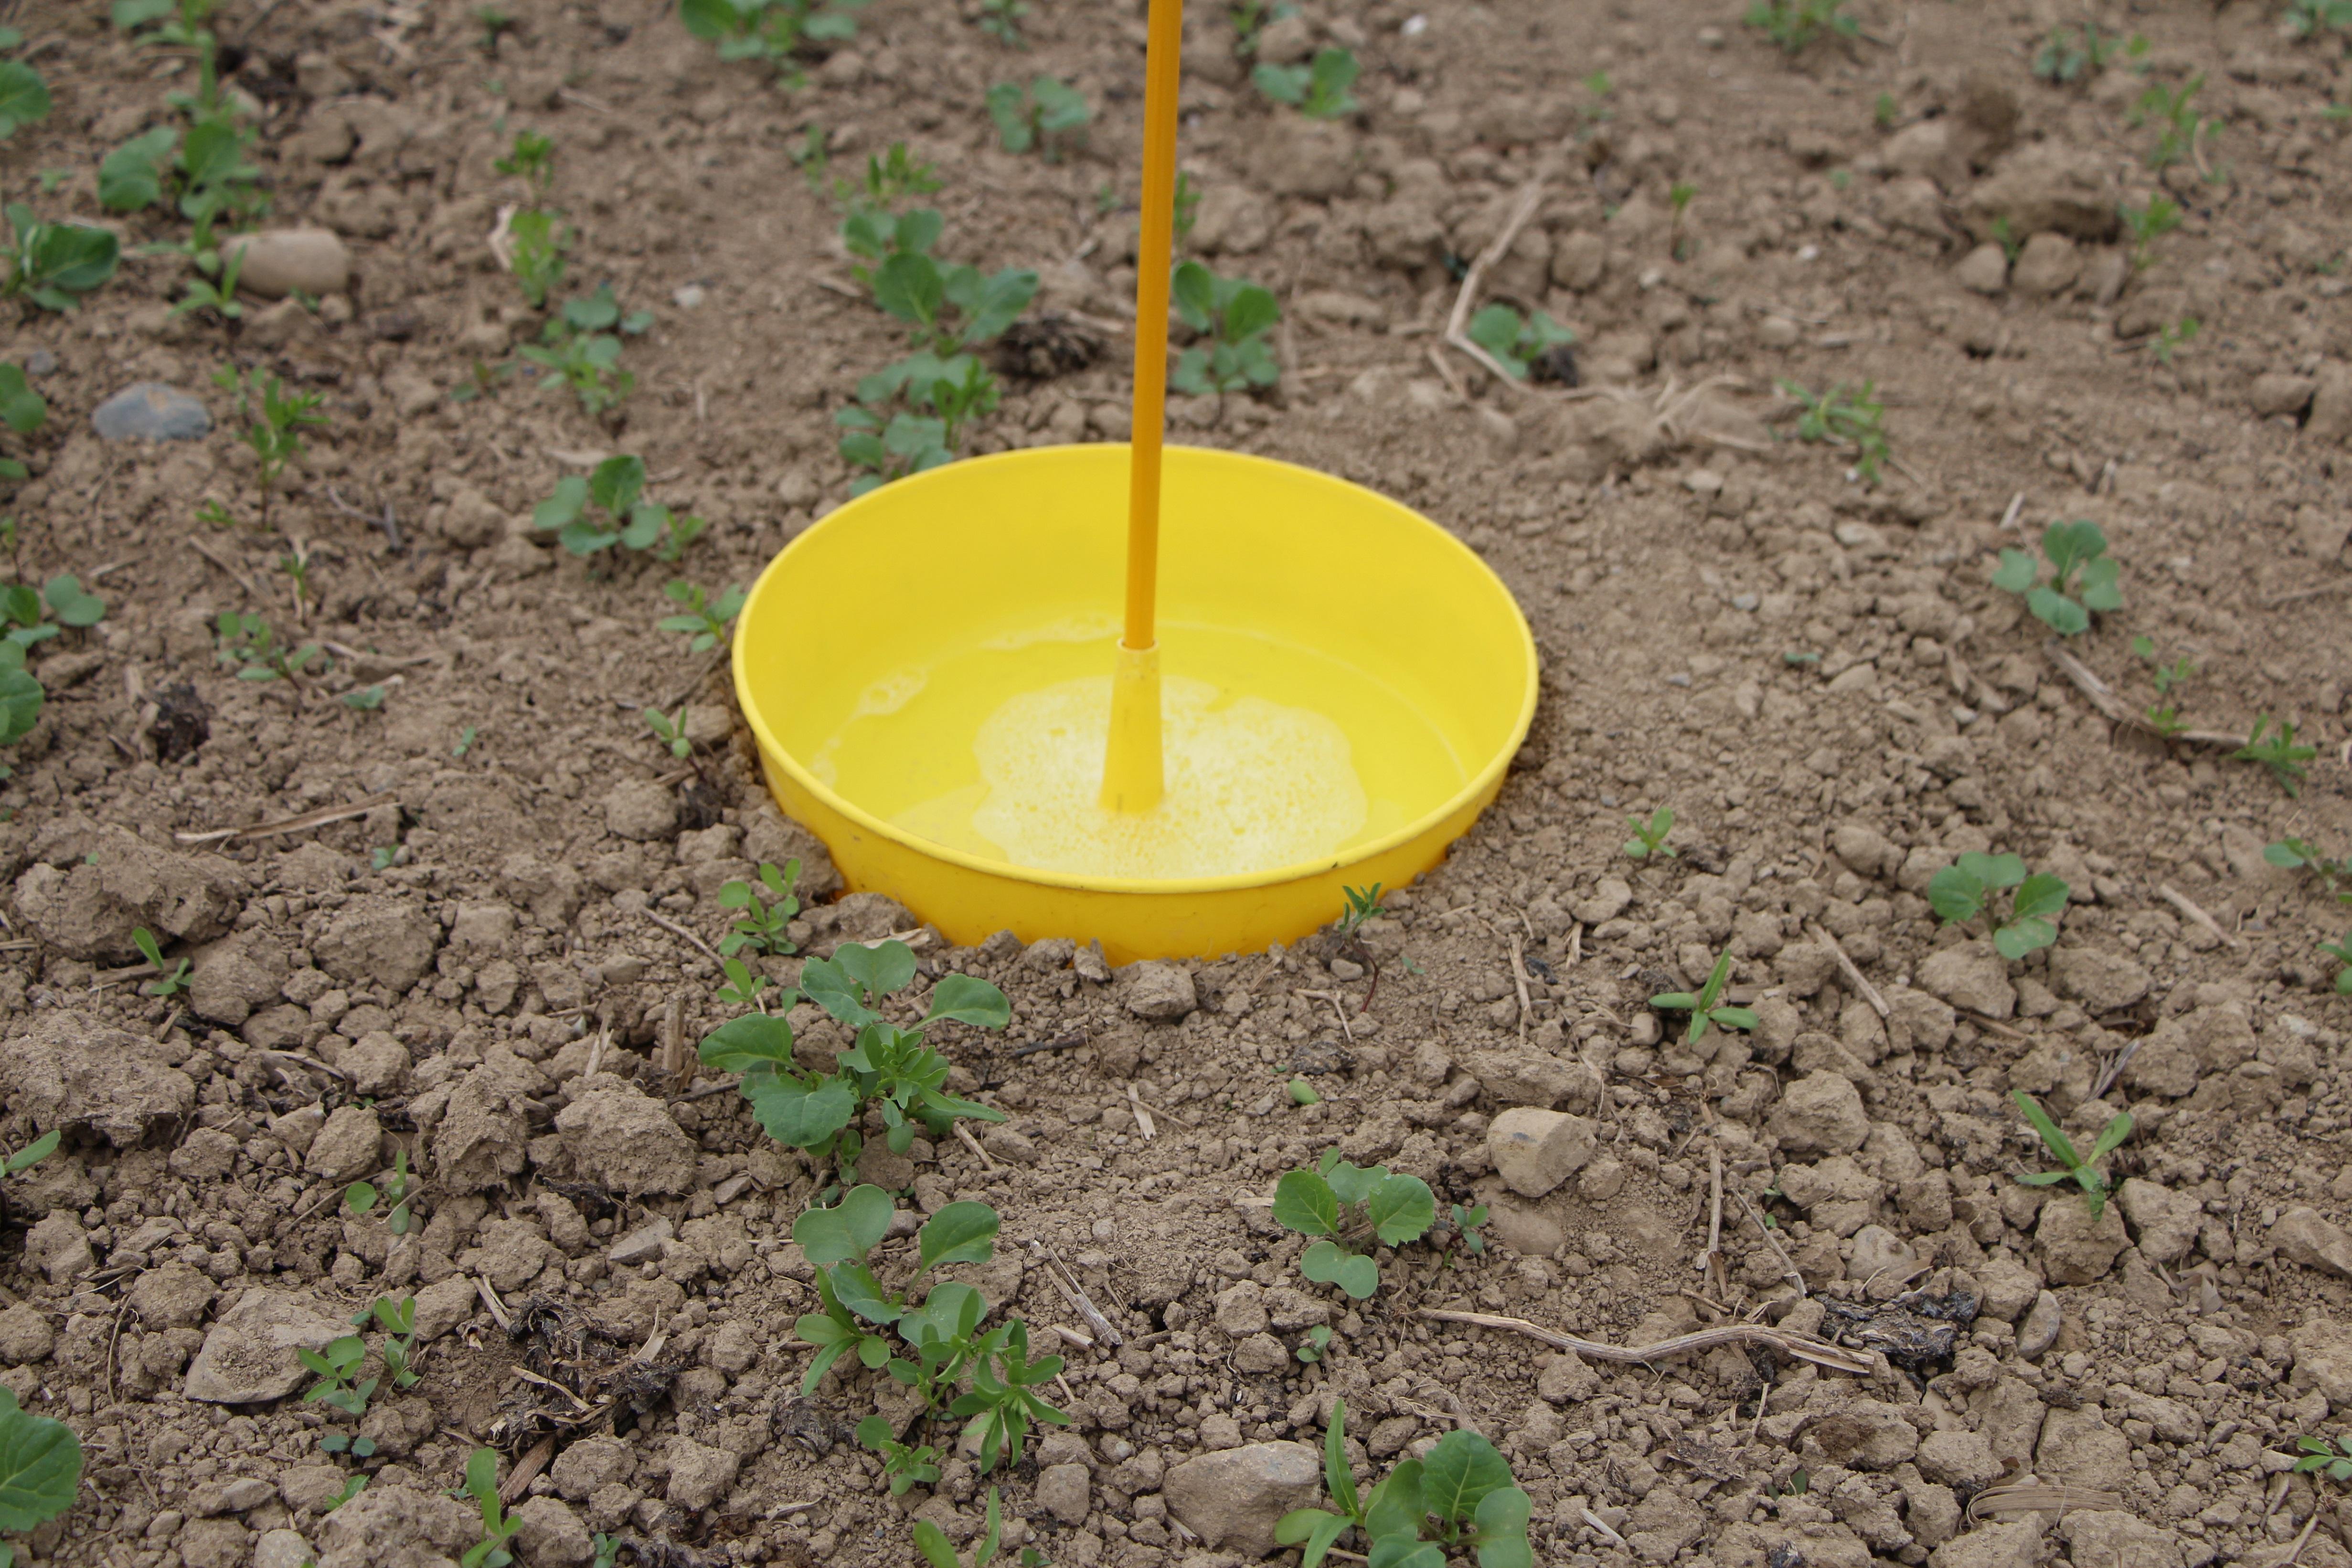 Pflanzenschutz-Bulletin